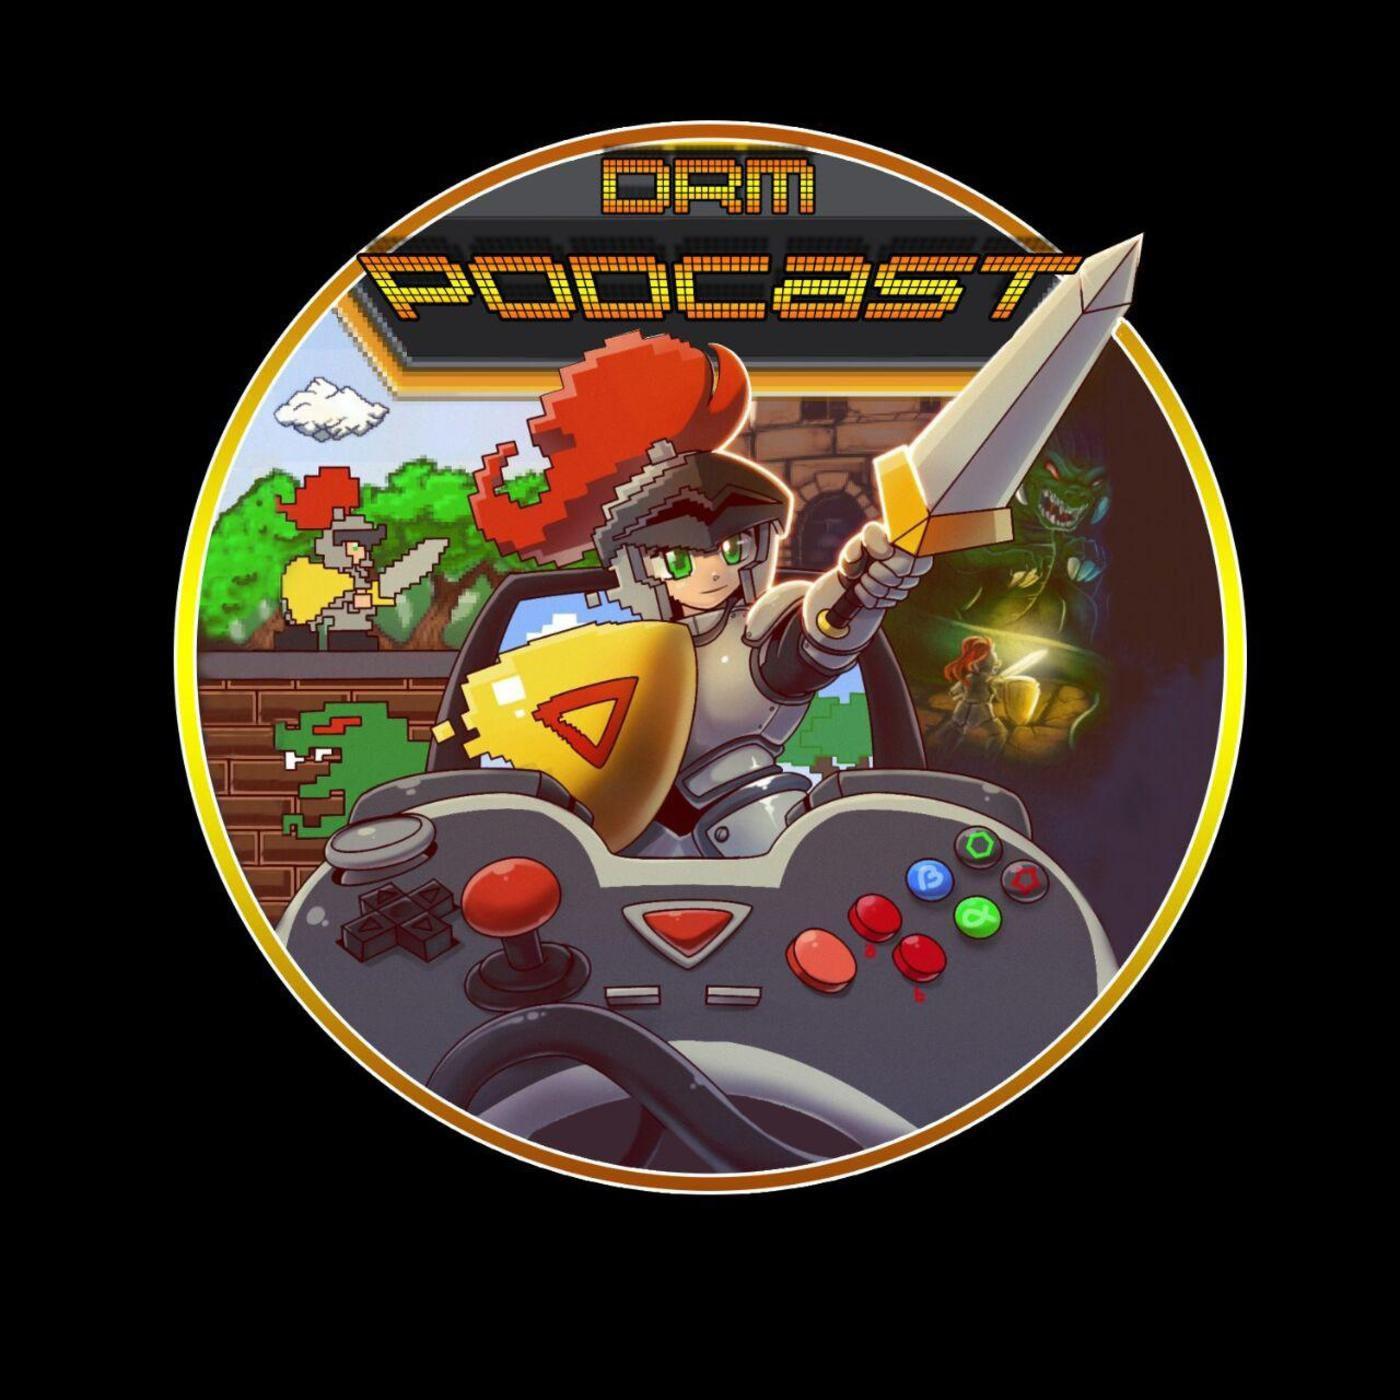 <![CDATA[DRM Podcast]]>